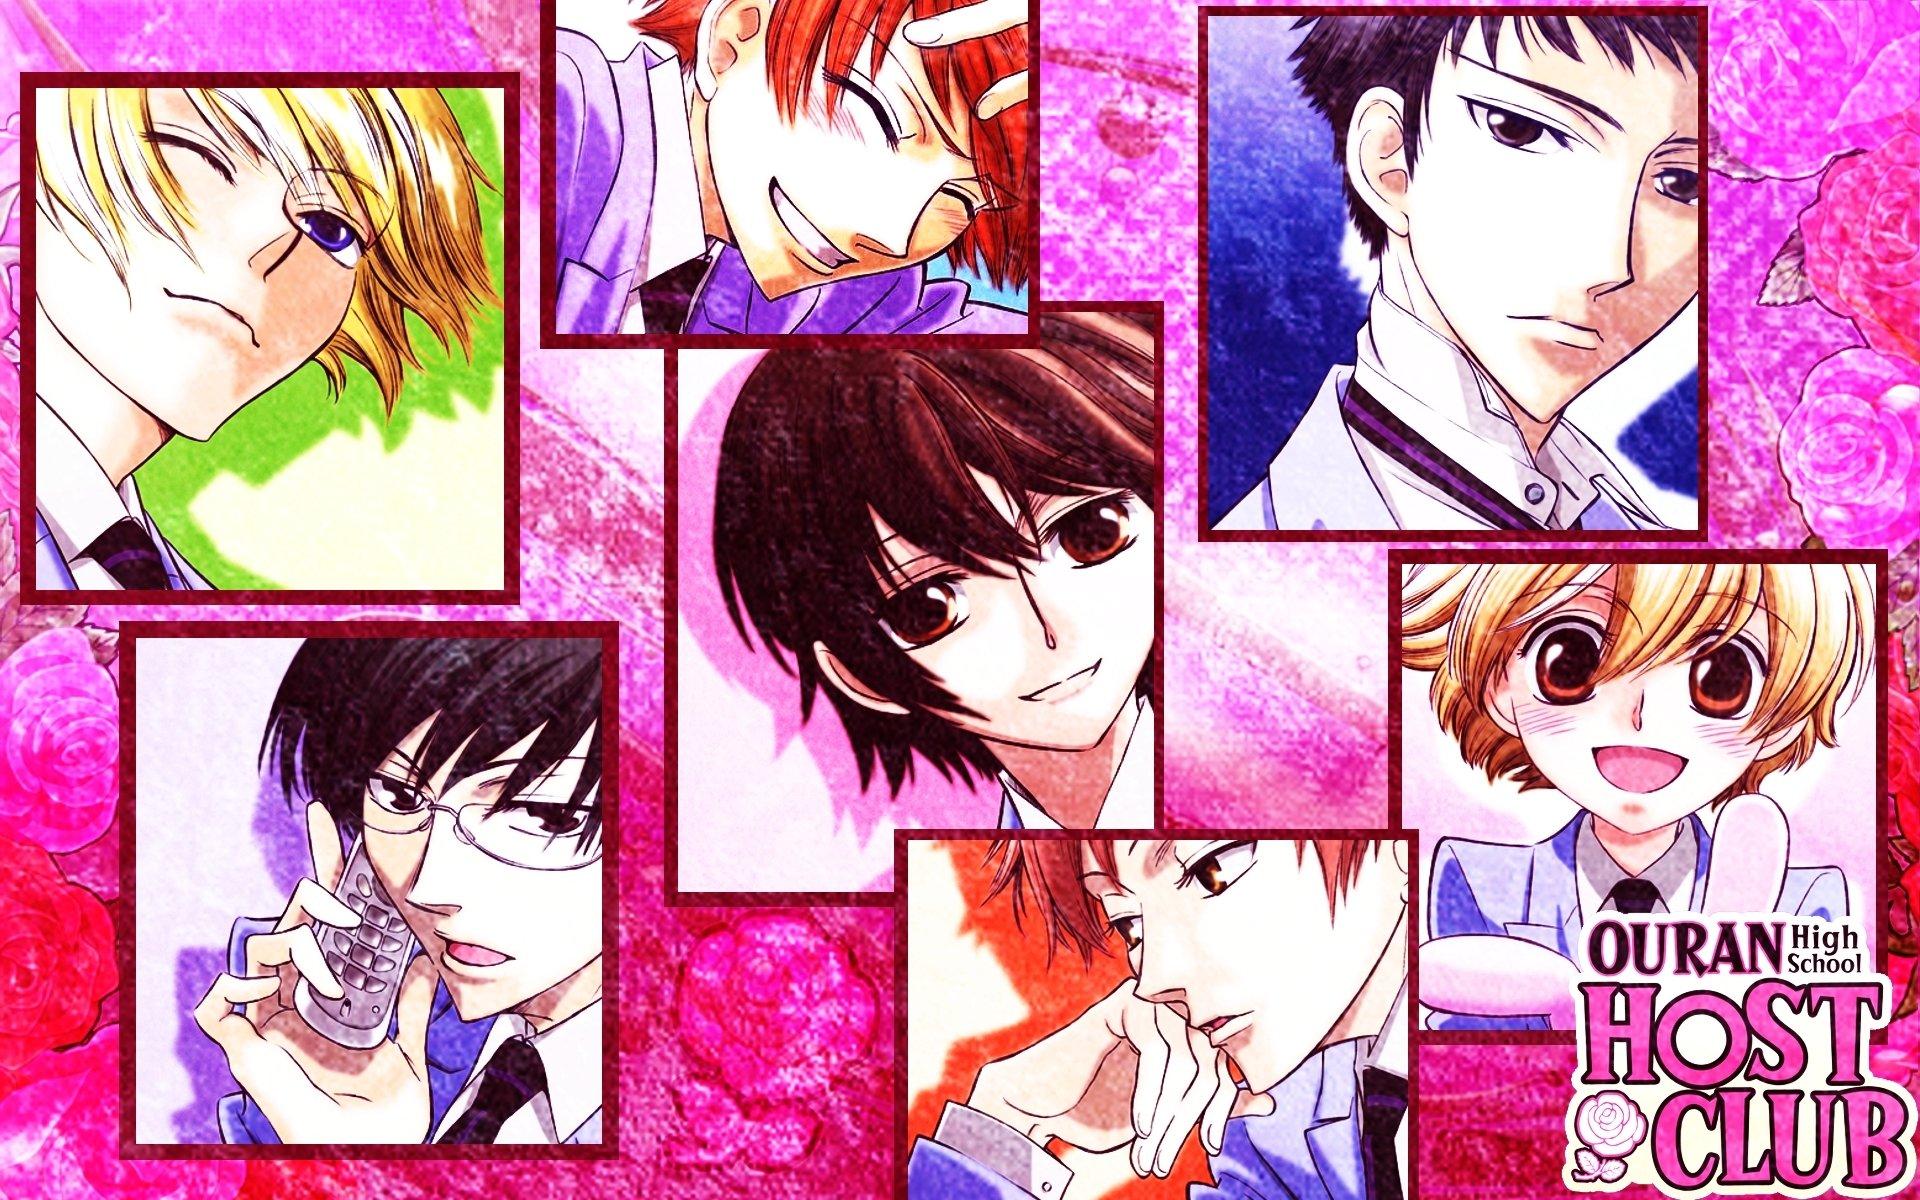 Ouran High School Host Club HD Wallpaper | Background ...